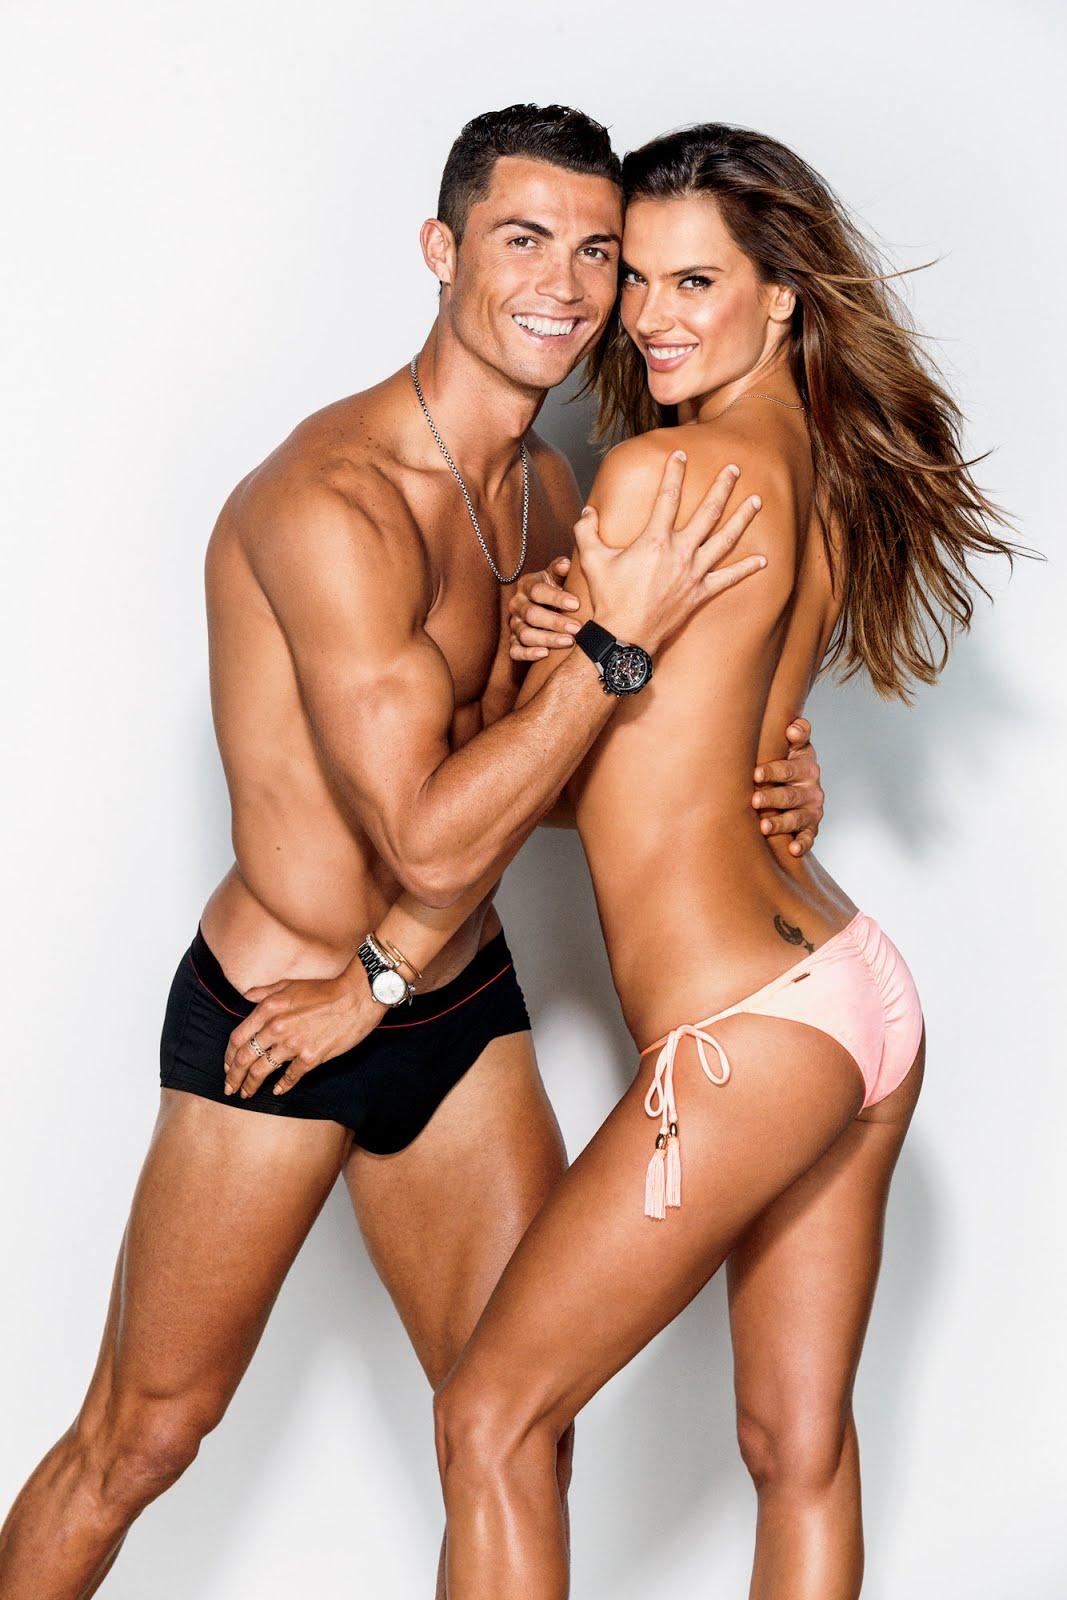 Cristiano Ronaldo Having Sex